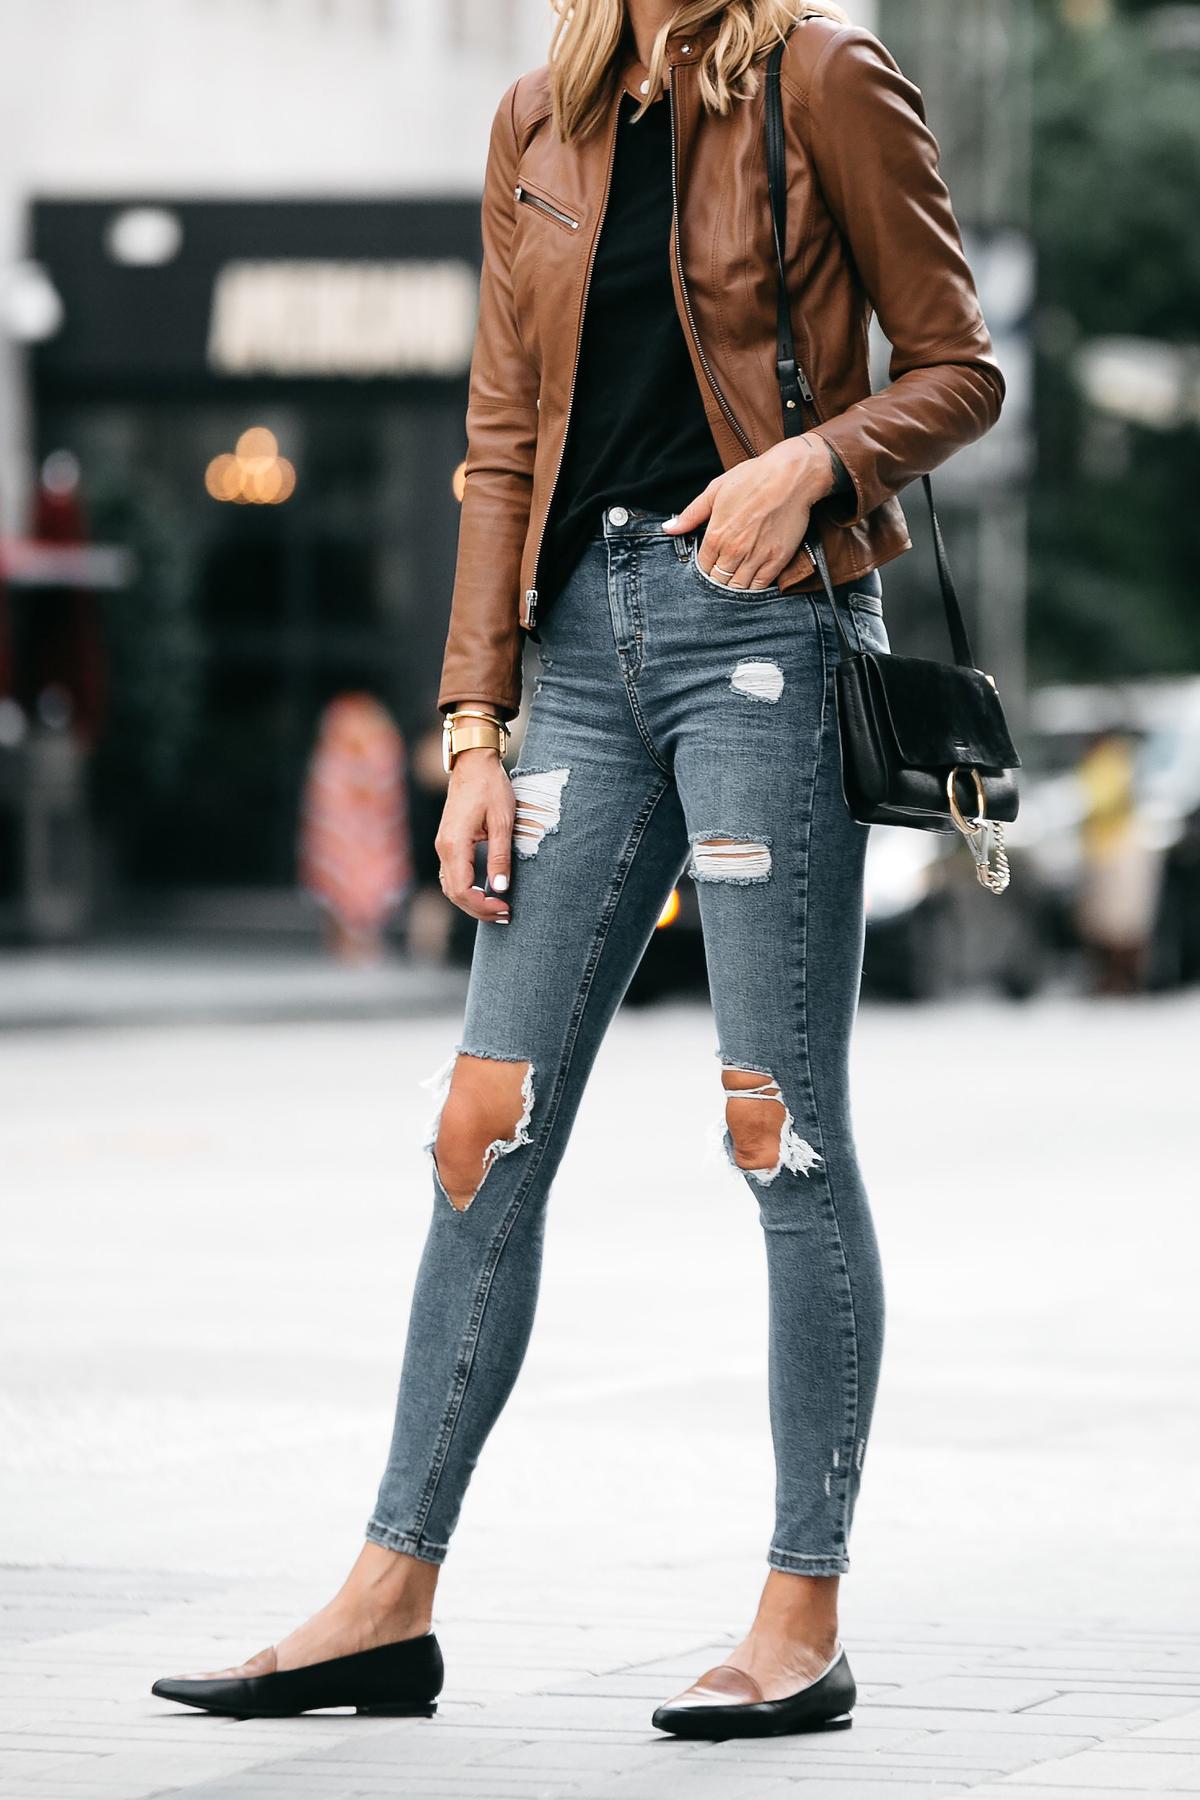 A TAN LEATHER JACKET YOU NEED FOR FALL | Fashion Jackson